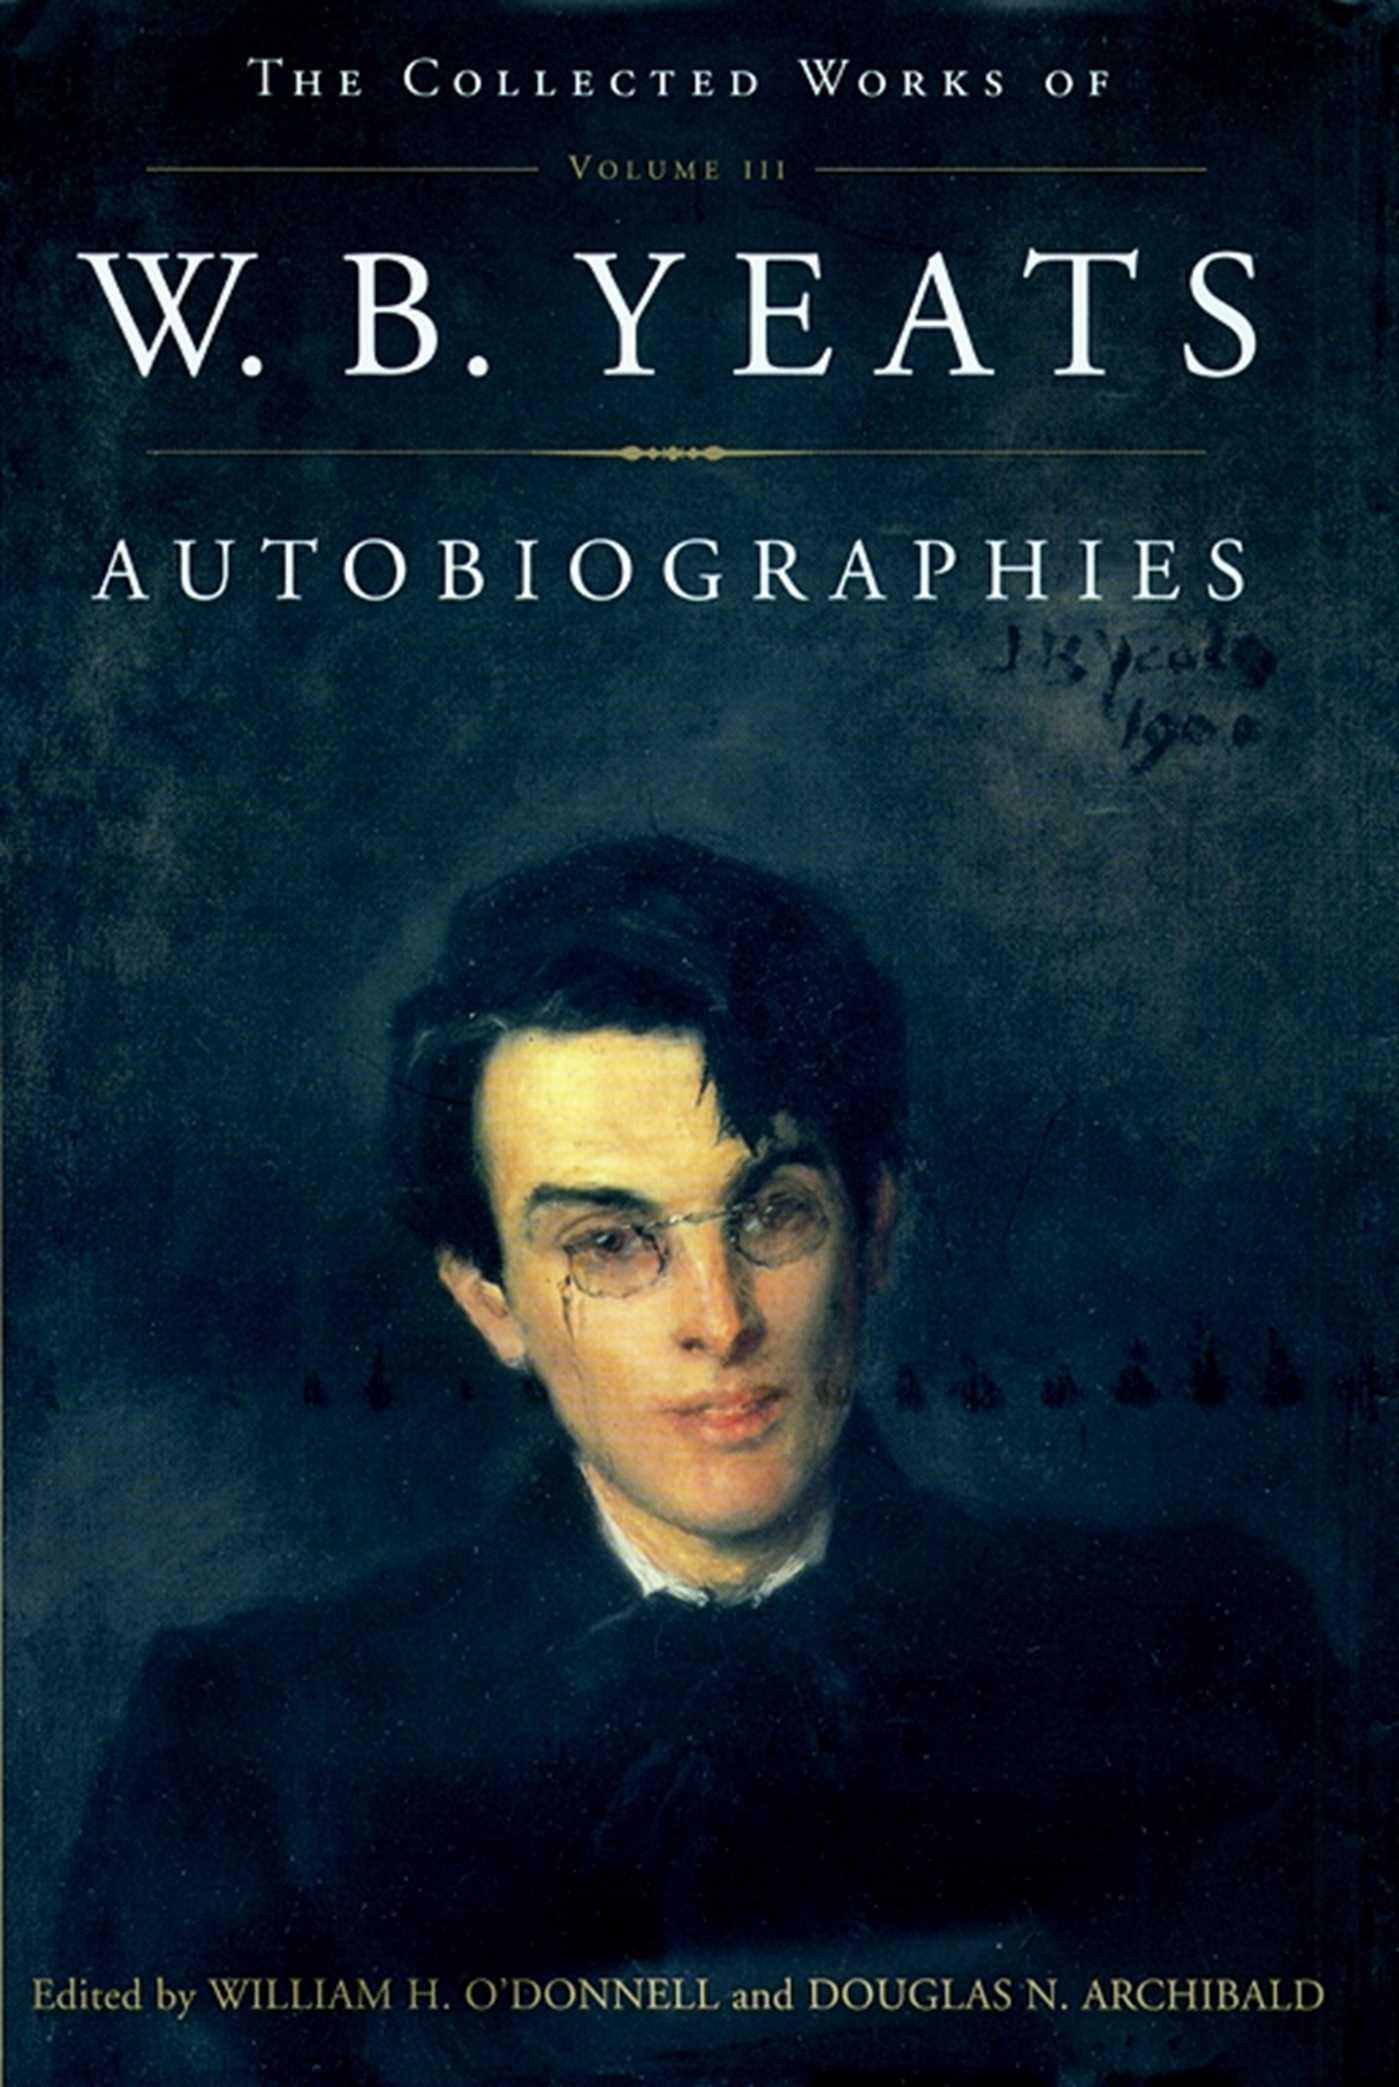 Autobiographies 9781451603033 hr